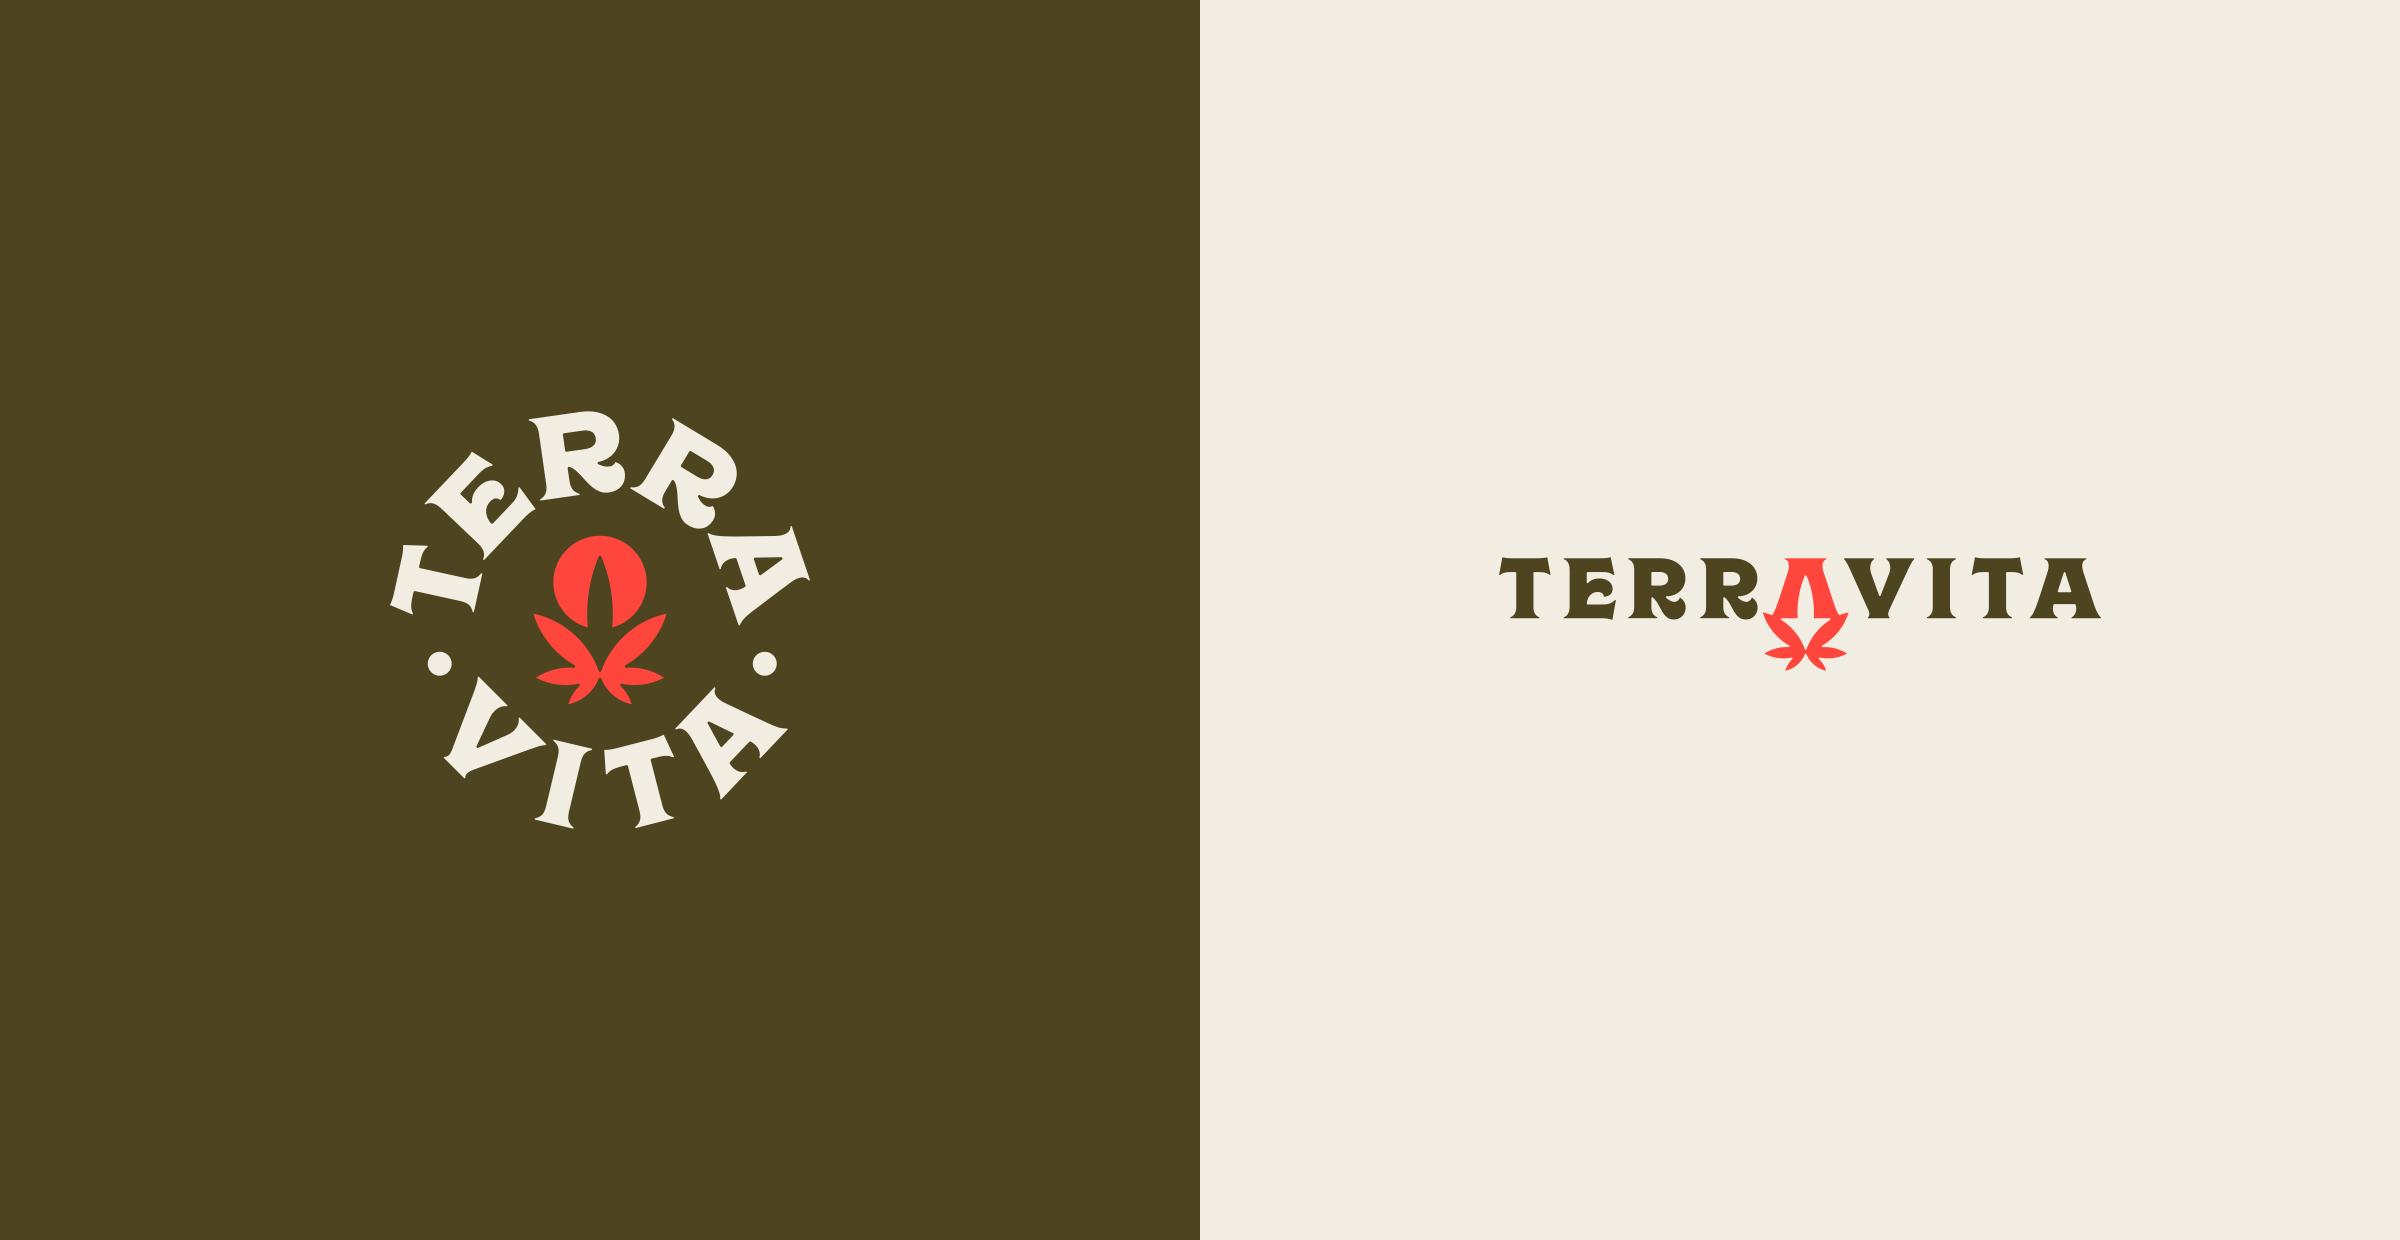 TBS_Terravita_Logo_3_v2